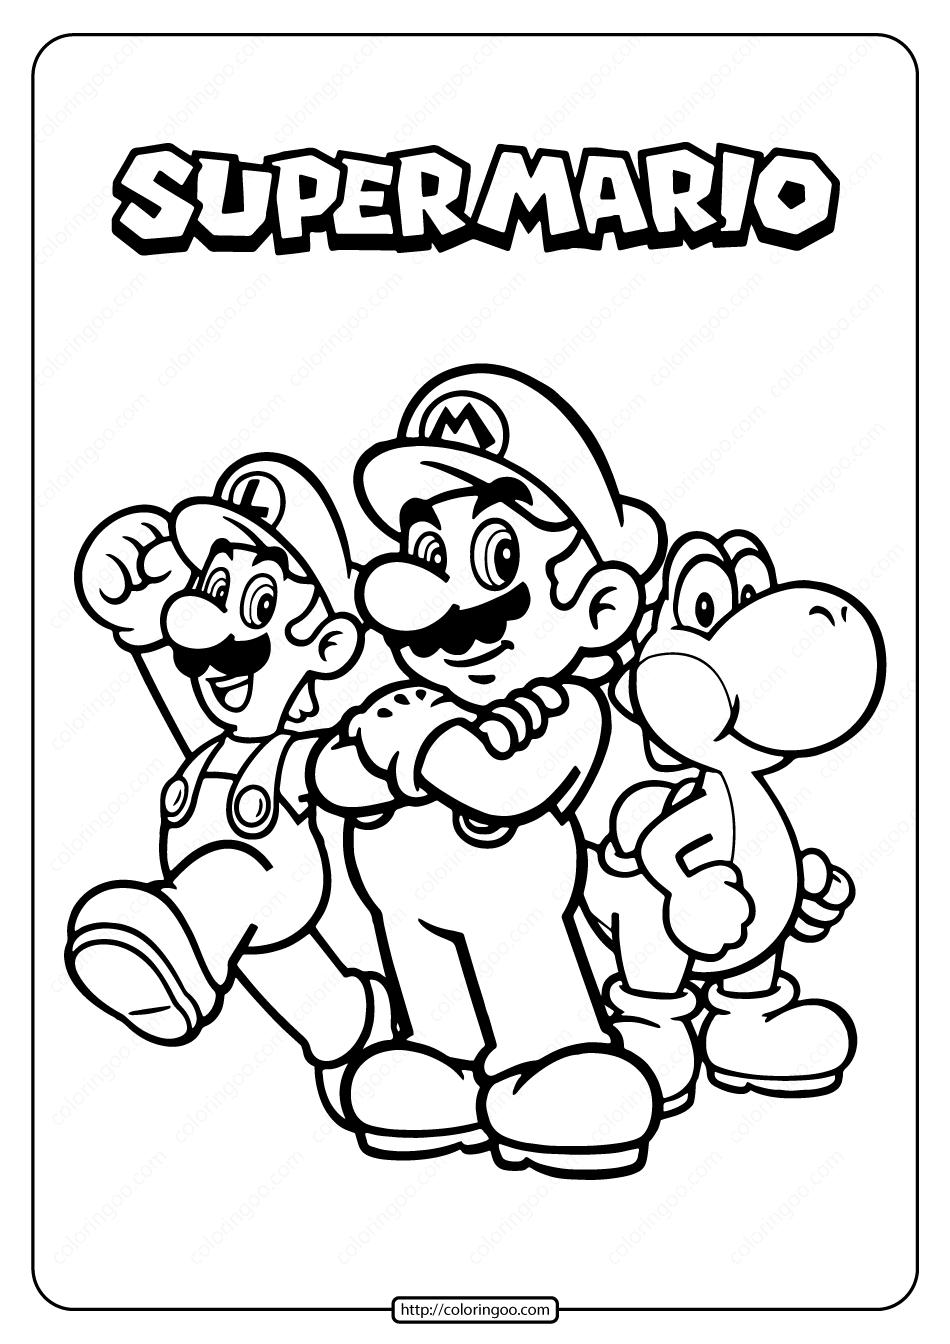 Free Printable Super Mario Pdf Coloring Page in 2020